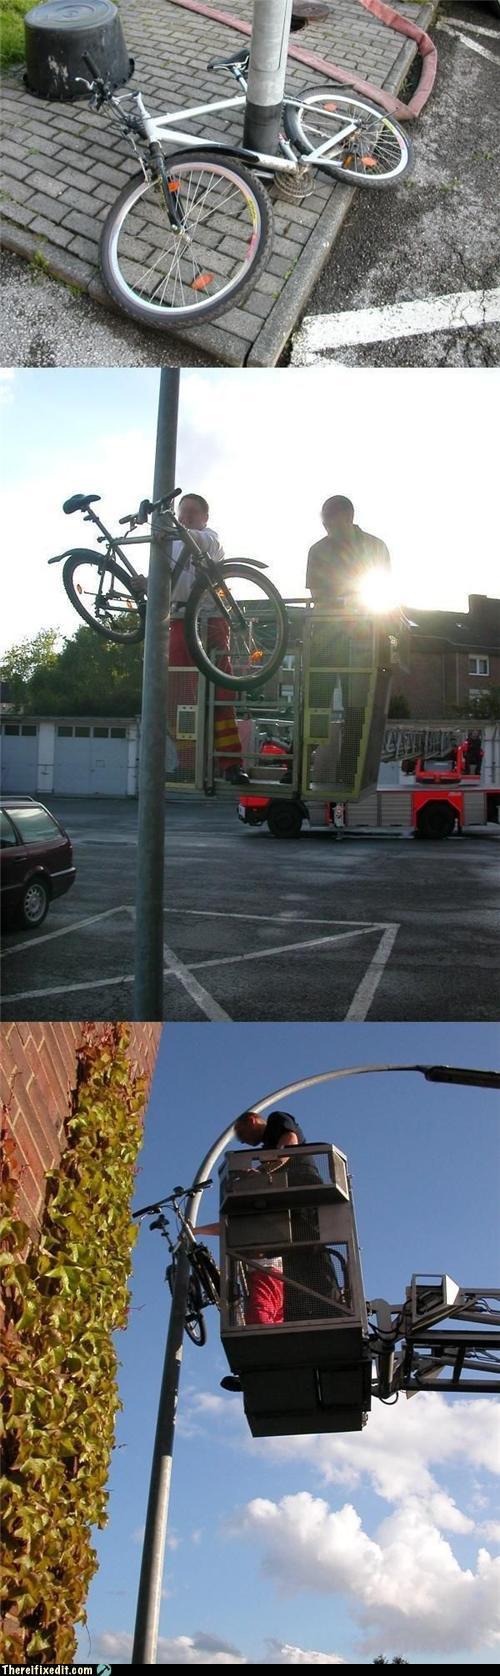 Bike security2